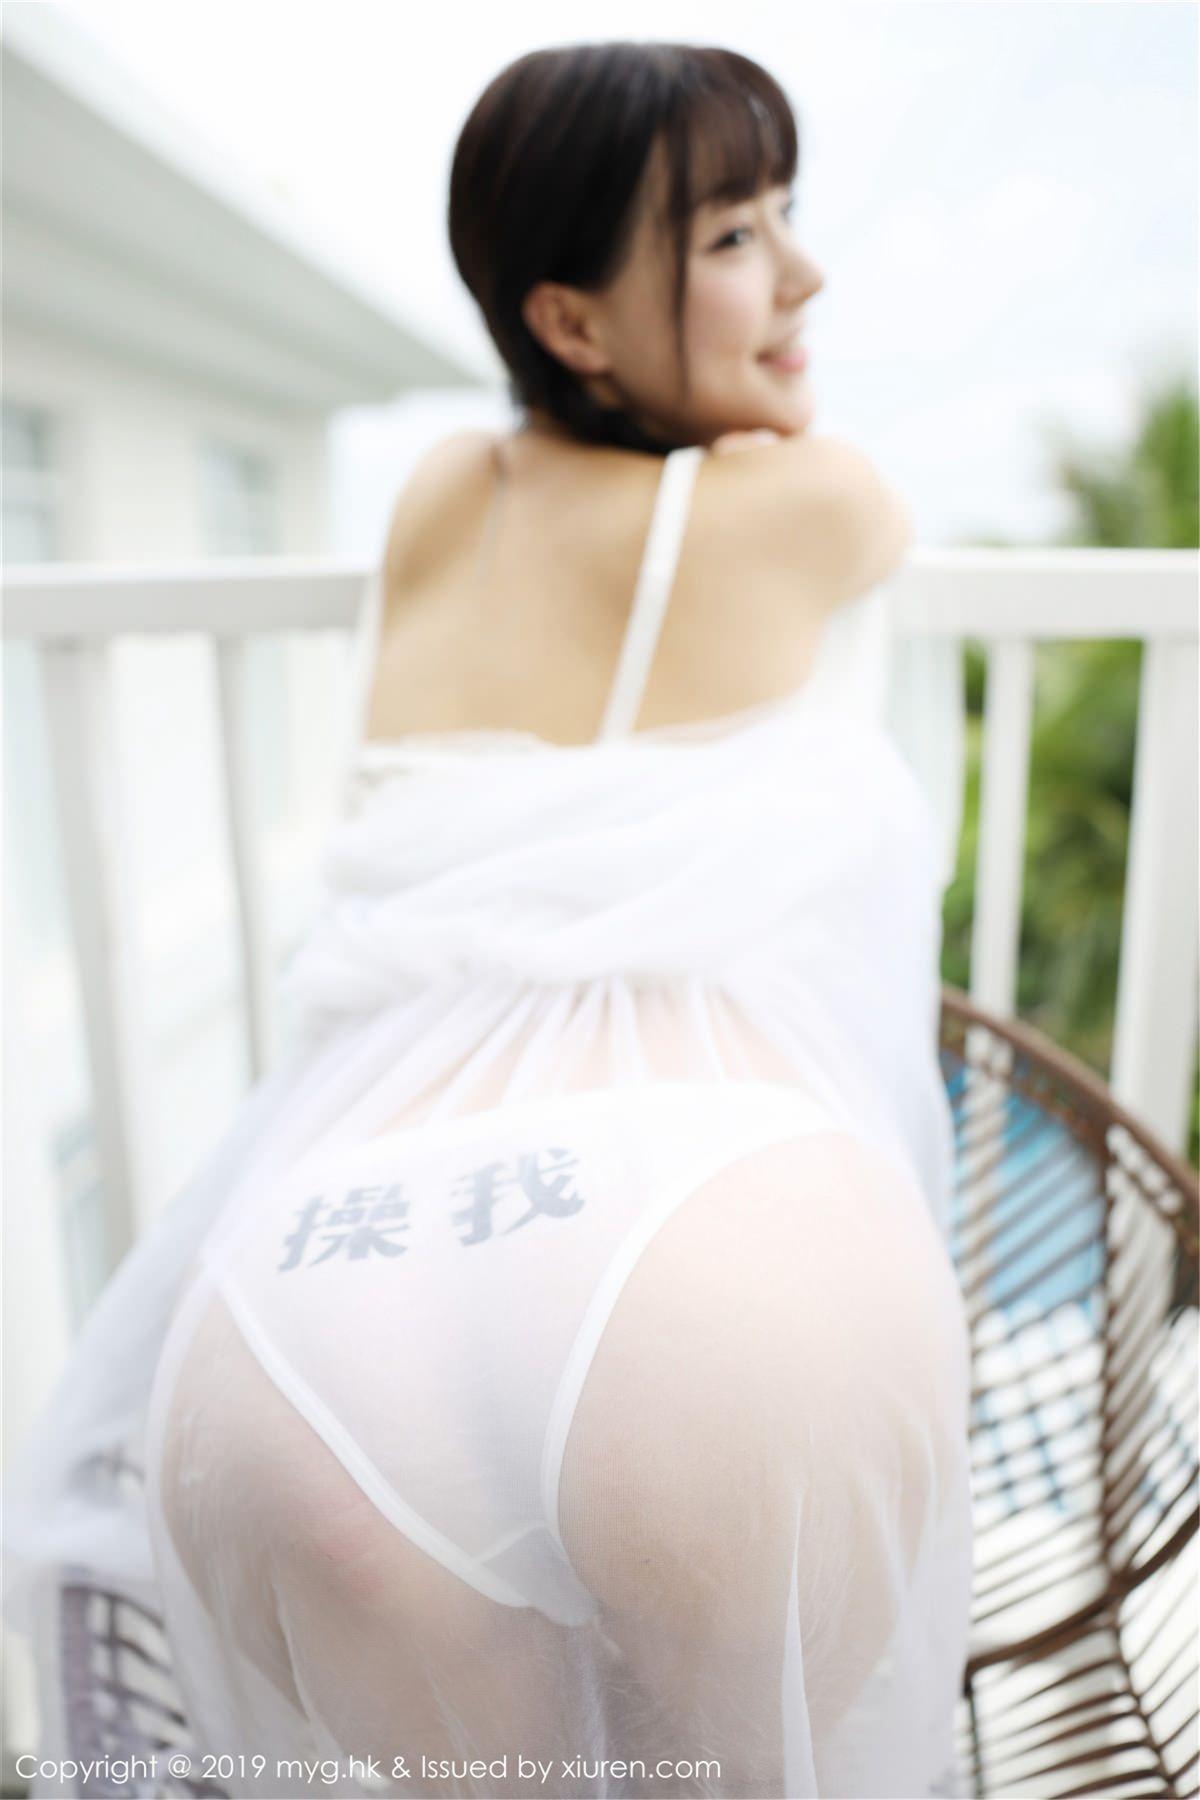 MyGirl Vol.360 35P, mygirl, Zhu Ke Er